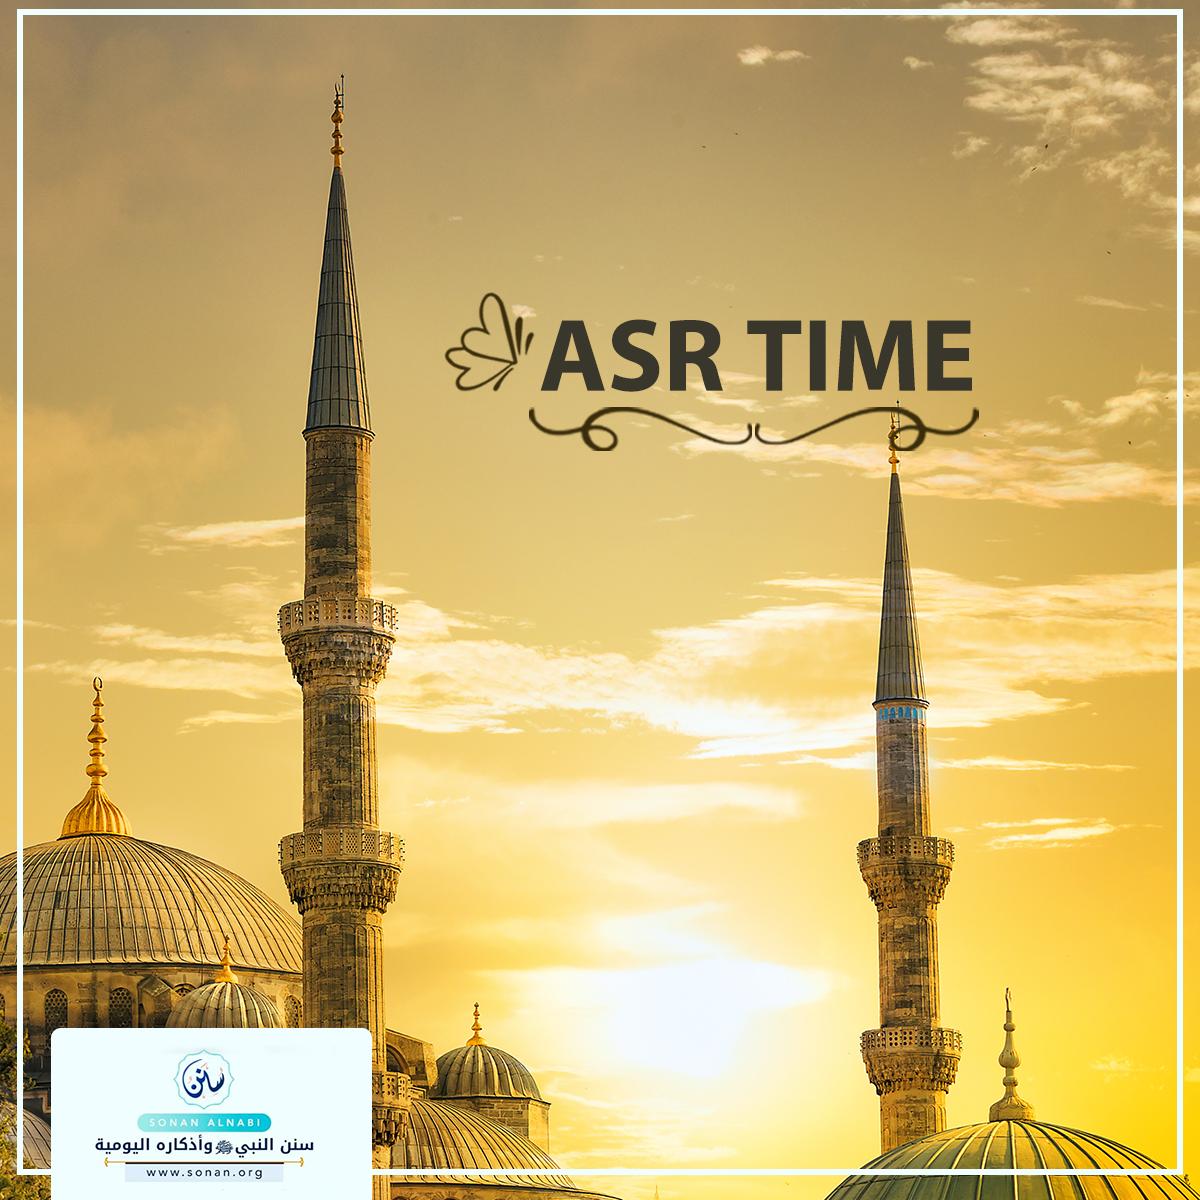 Asr Time